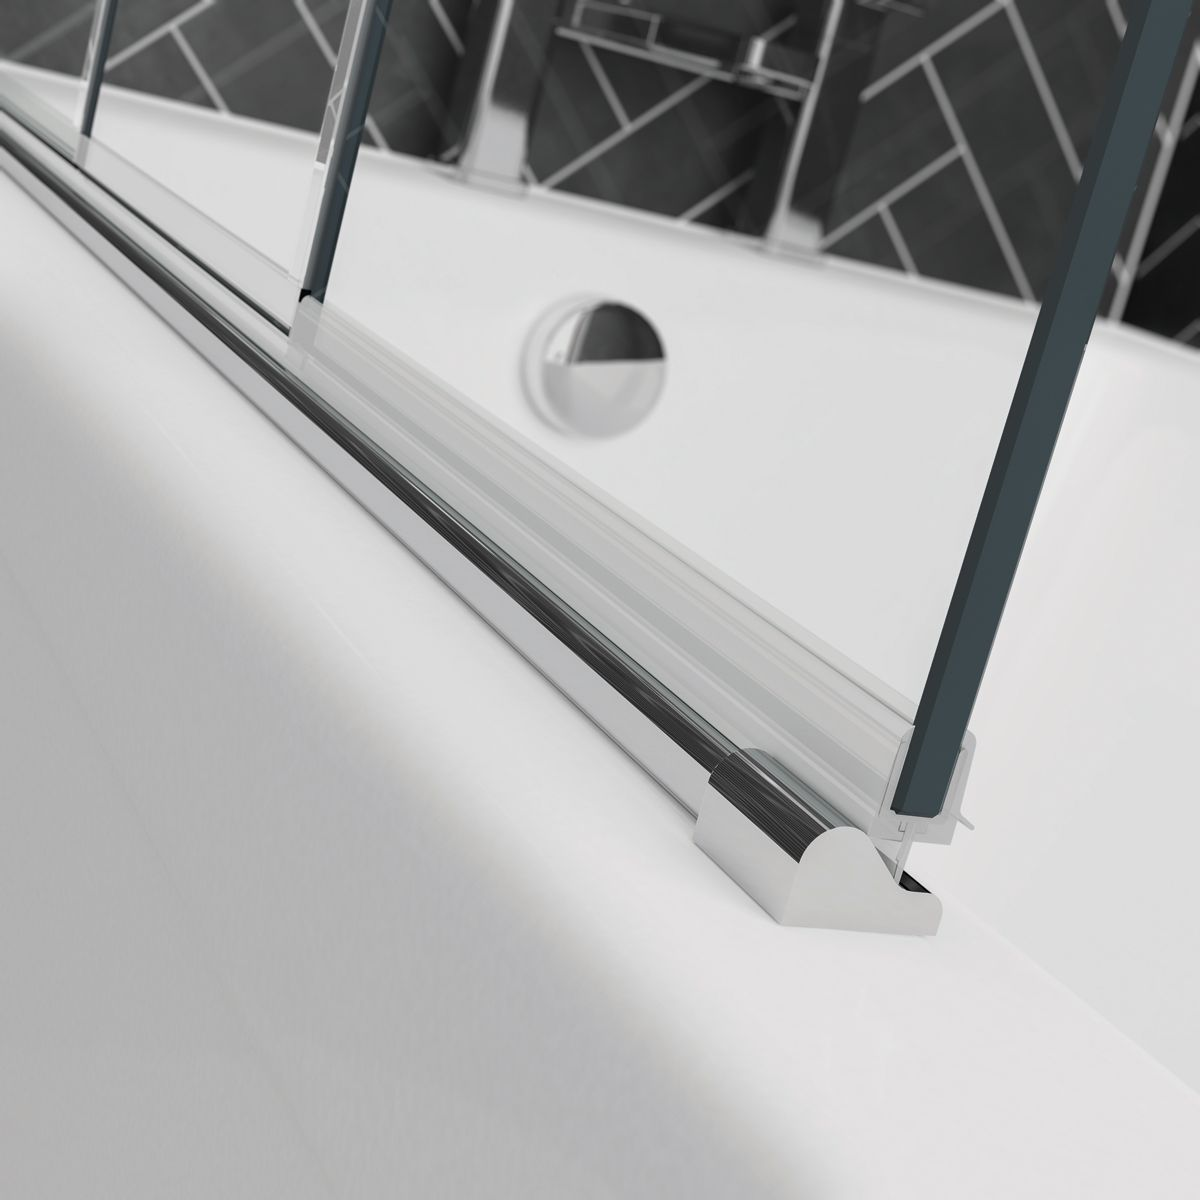 April Prestige Frameless 4 Fold Bath Screen Seal